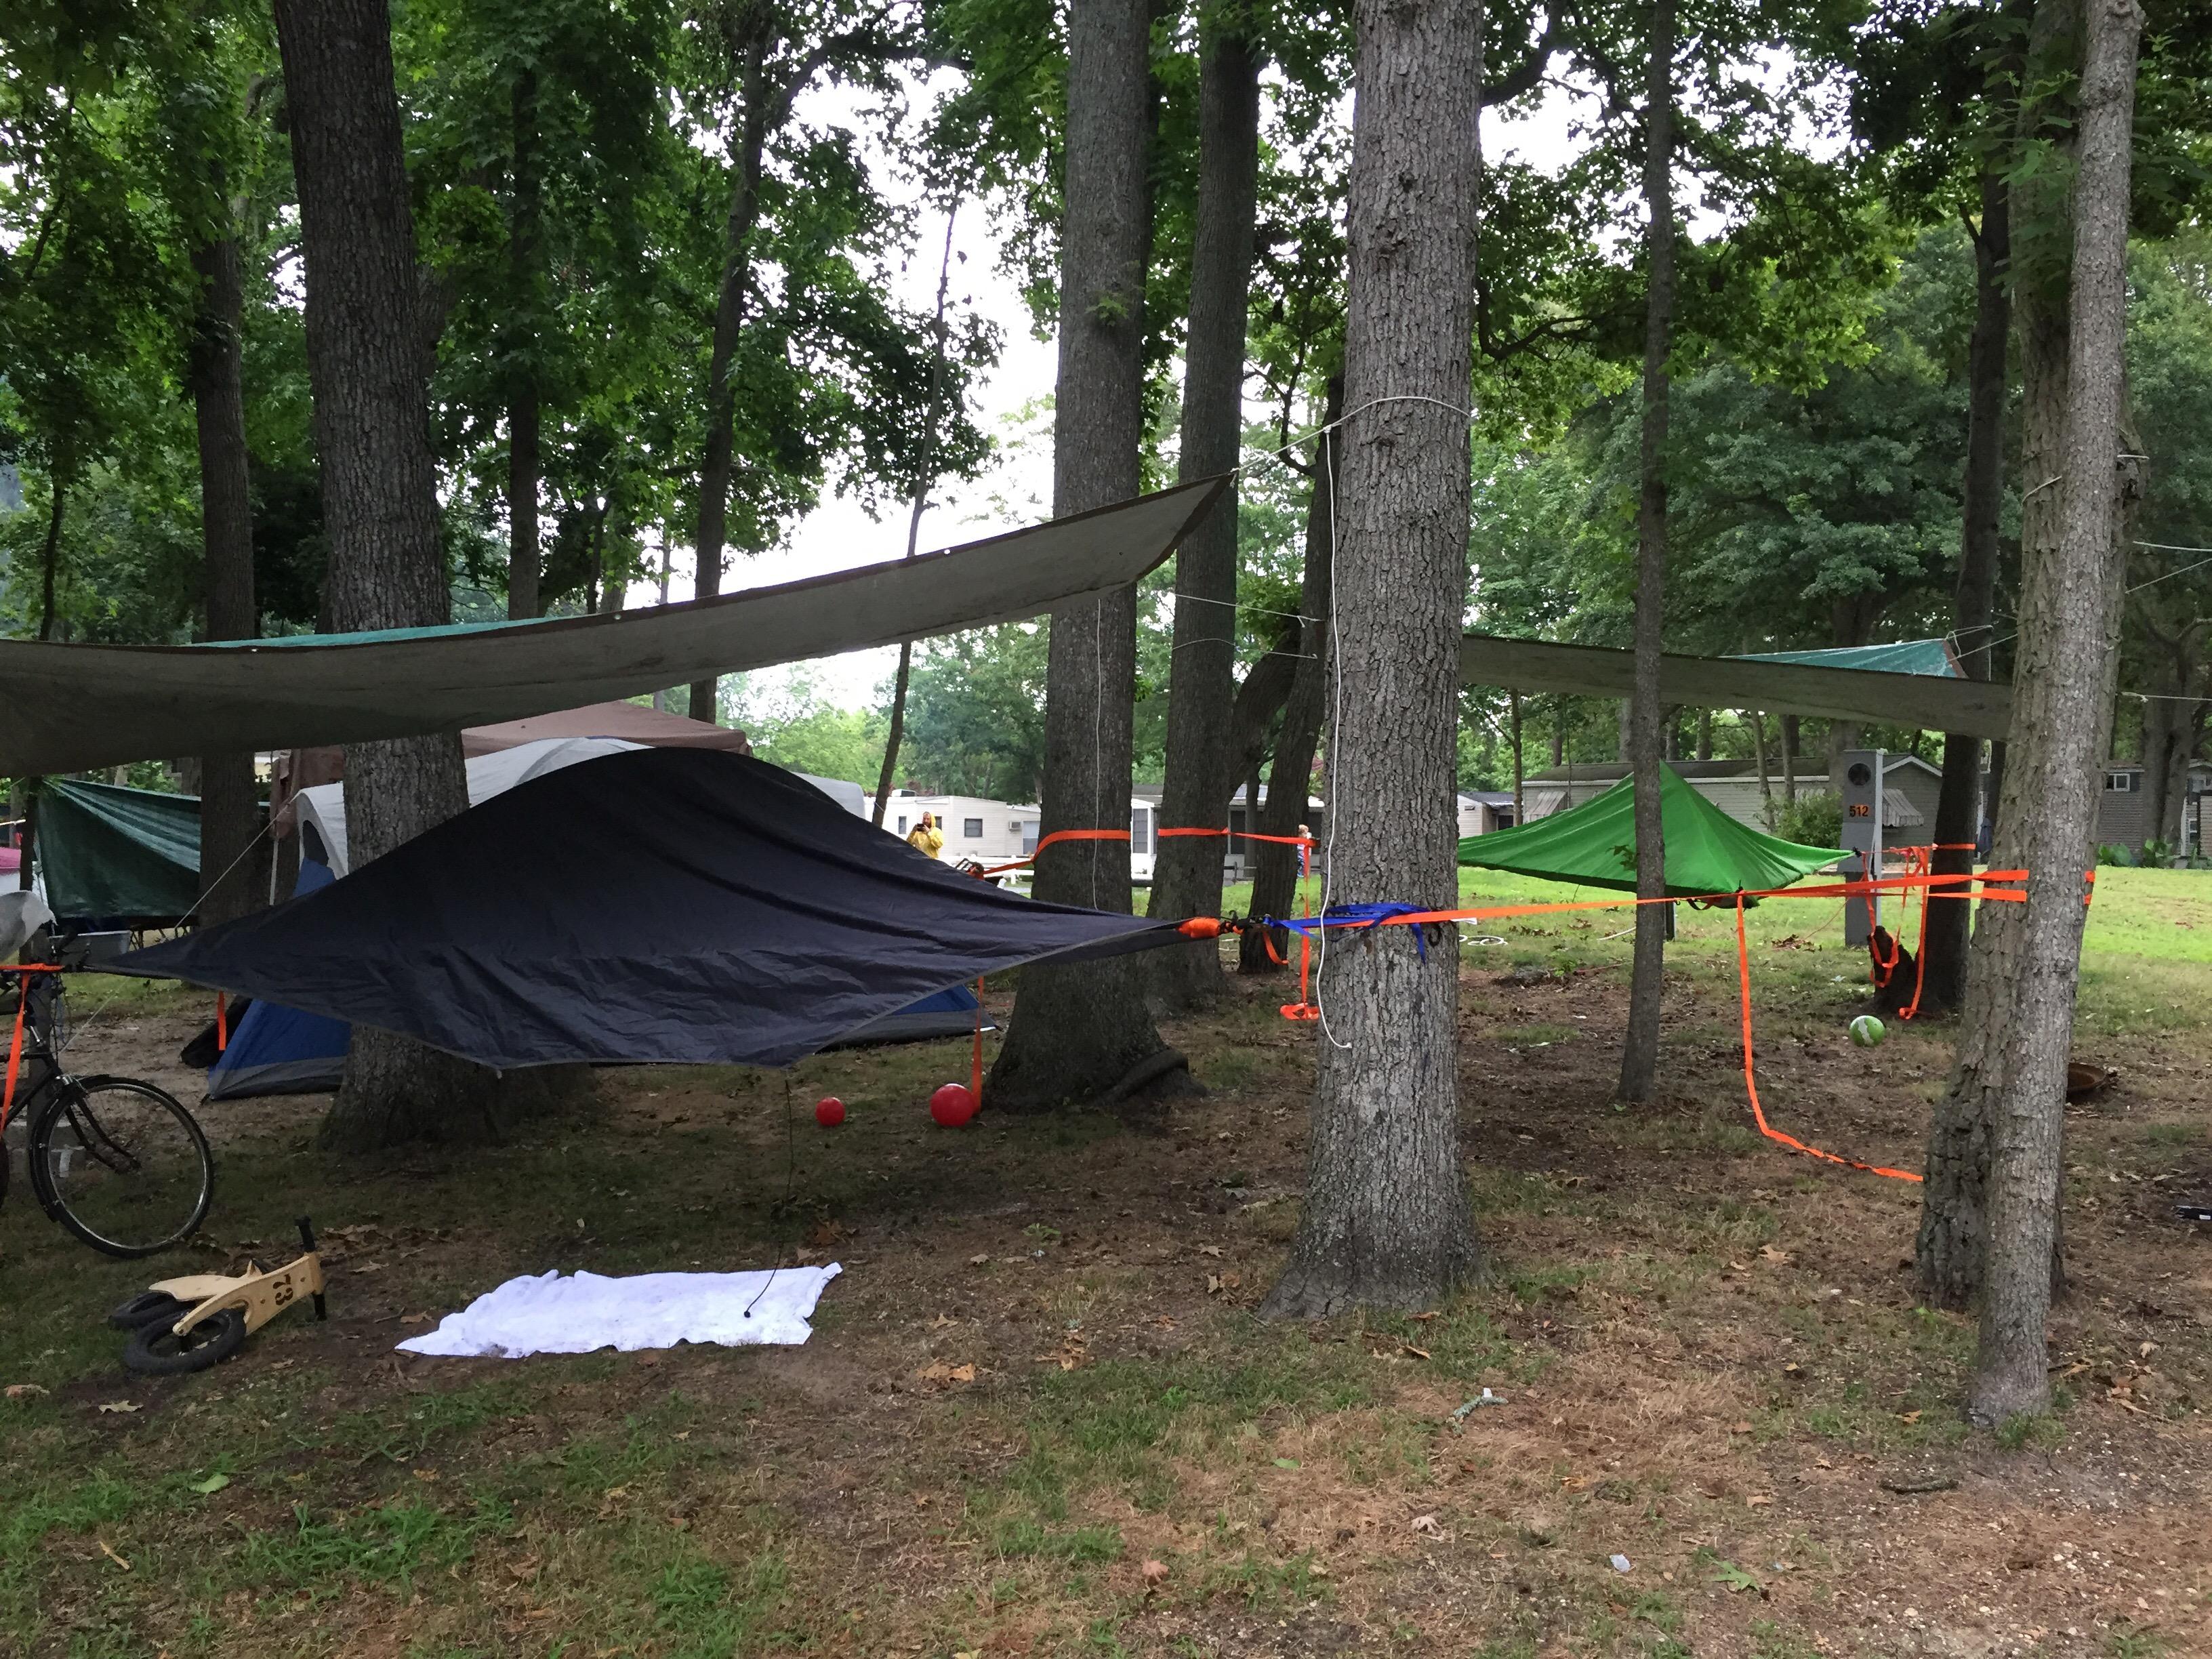 by stingray photography copy safari tentsile tent d of s hammock